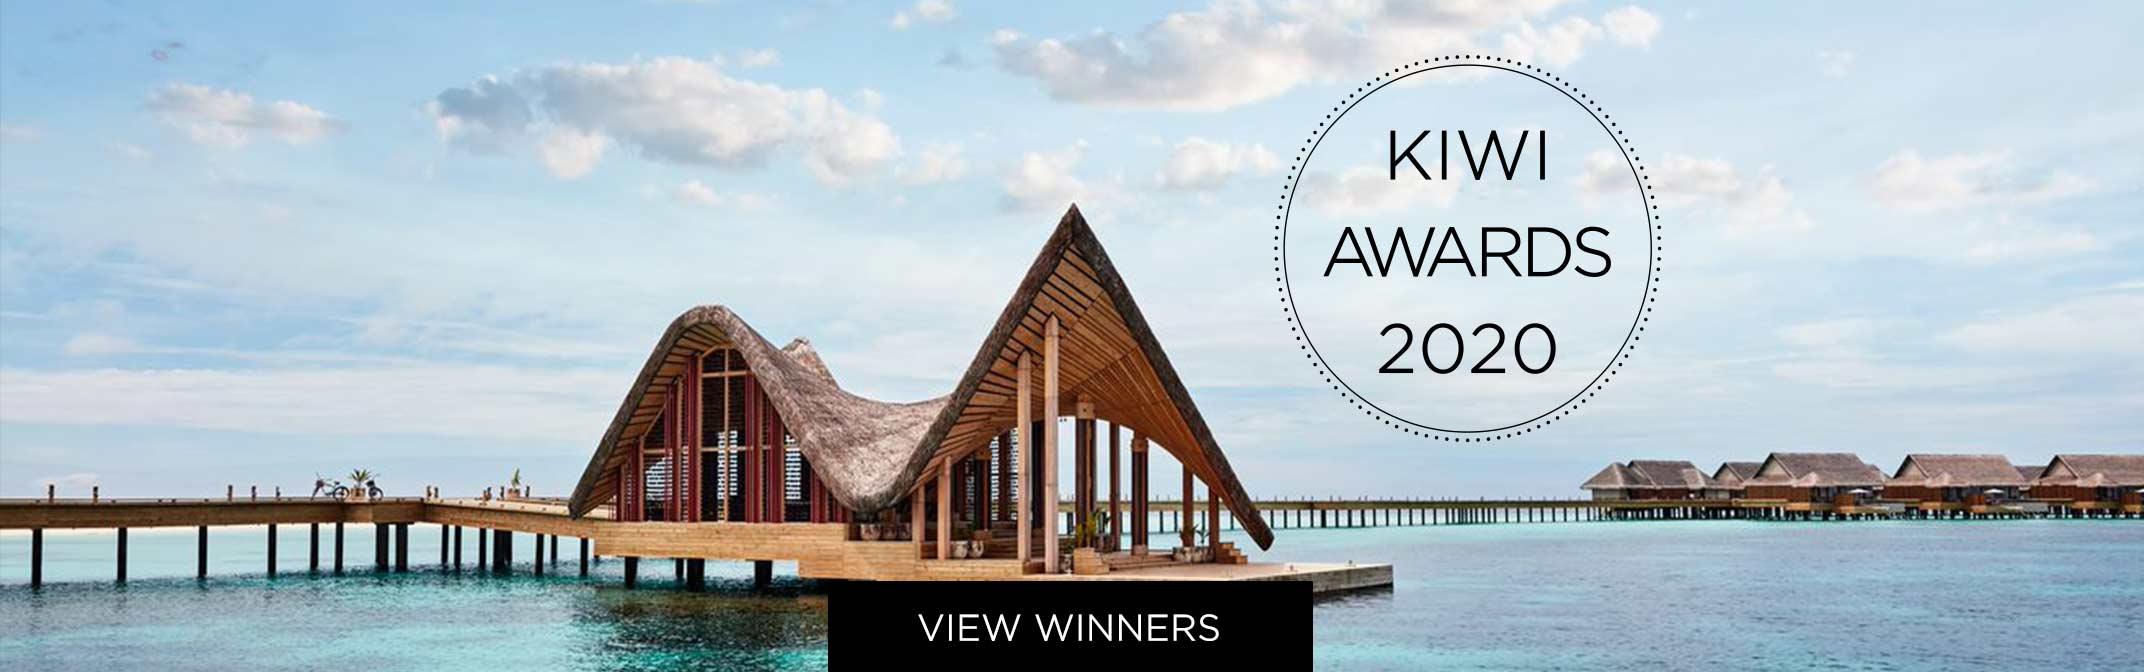 View the Kiwi Collection 2020 award winners